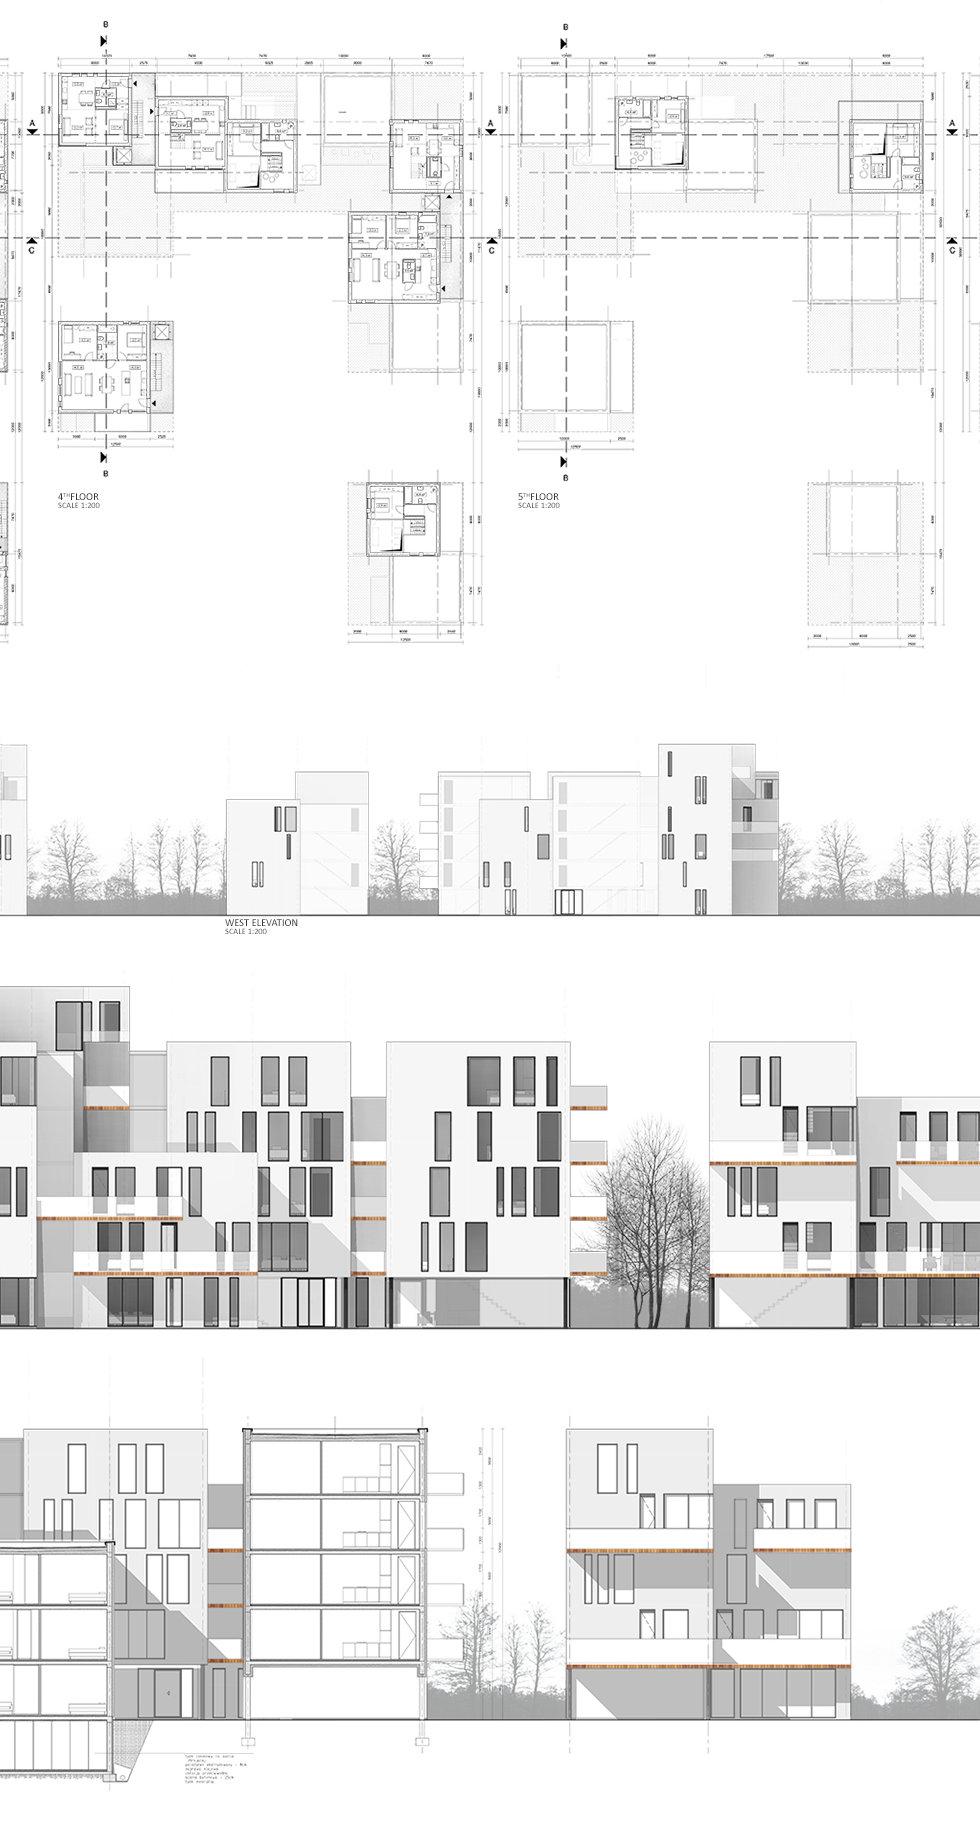 Plans&Section.jpg